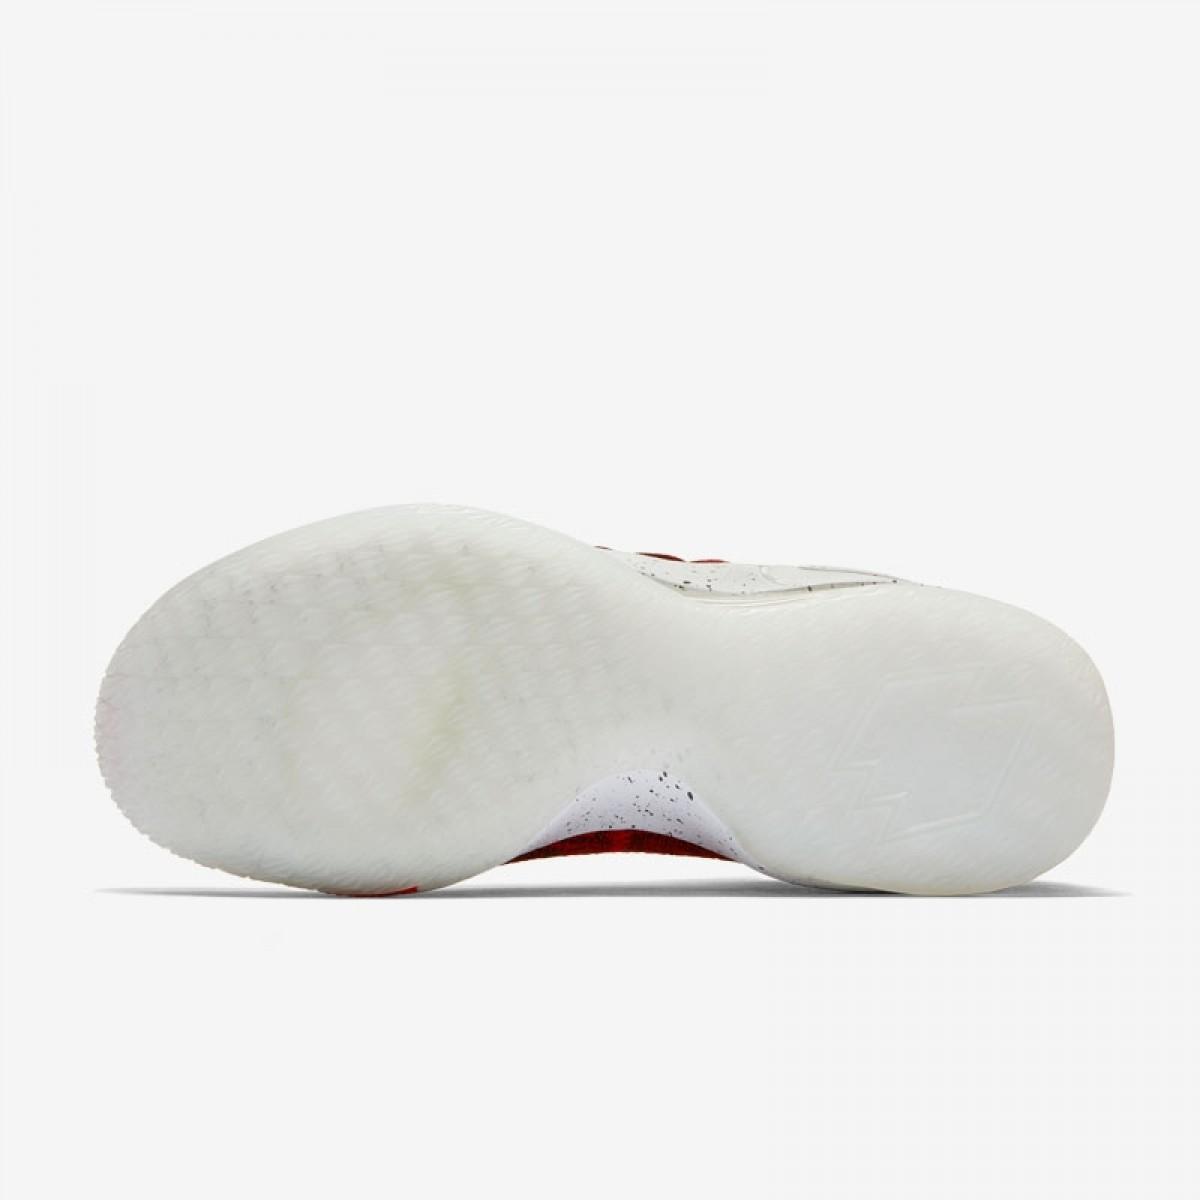 Nike Lebron XV Low 'University Red' AO1755-600